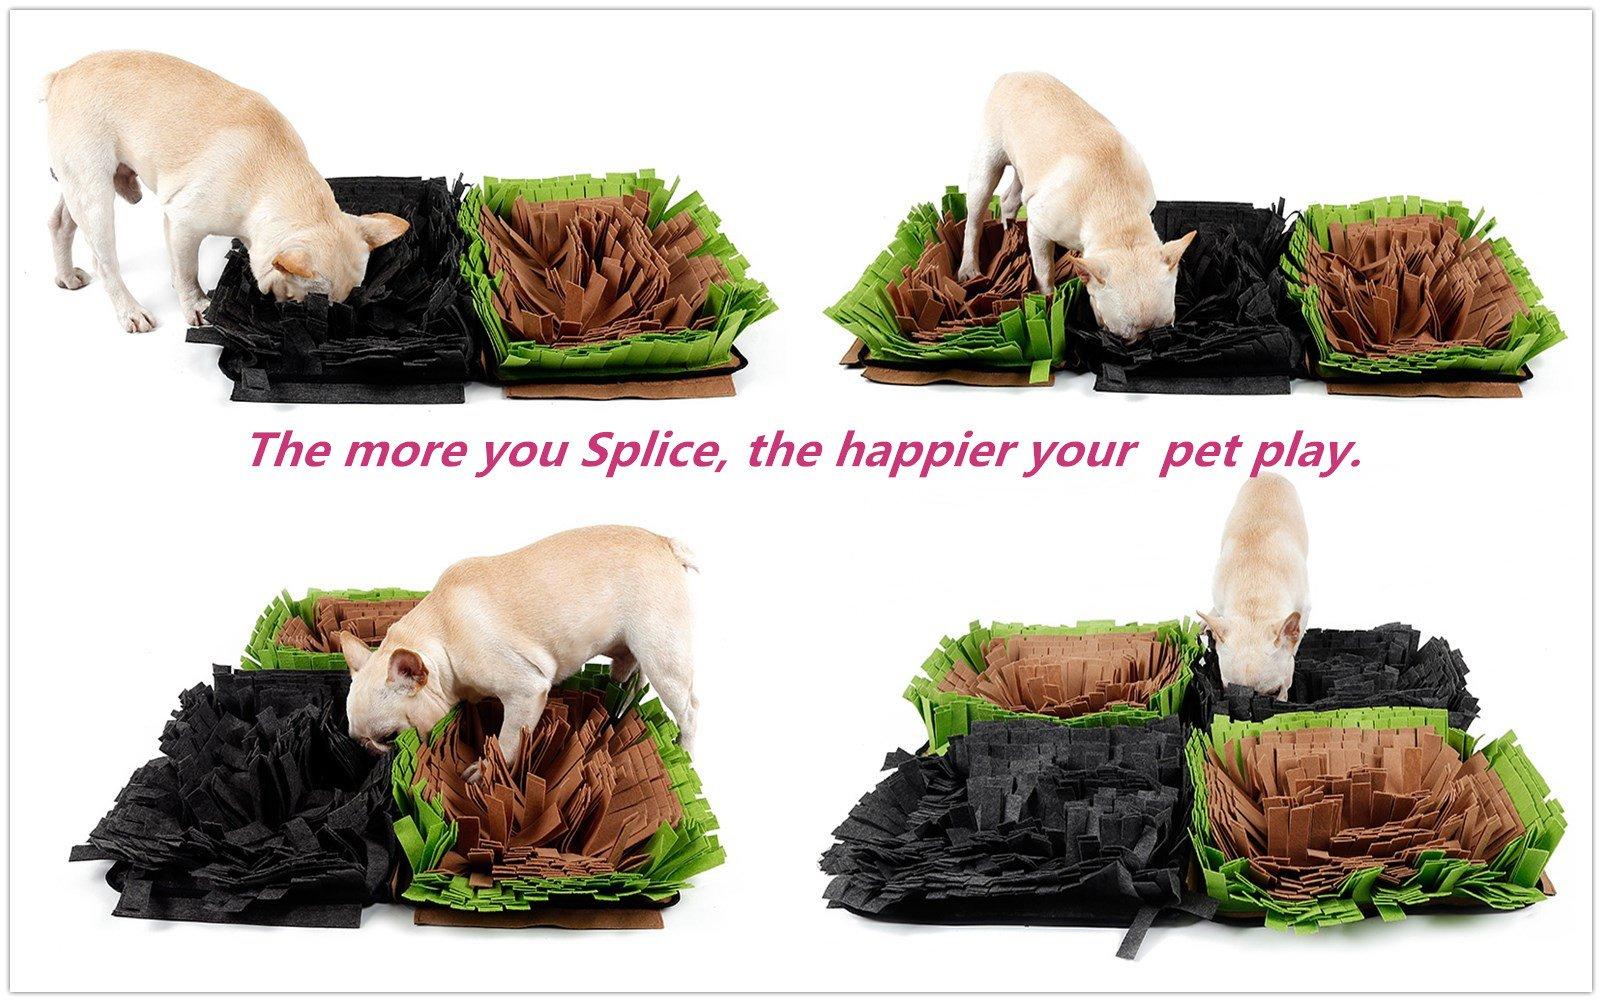 KenBu Pet Snuffle Mat,Dog Nosework Mat, Dog Nose Work Blanket,Slow Feeding Mat Dog Training and Feeding Mat Dog Play Mat for Small, Medium and Large Dogs (Green)